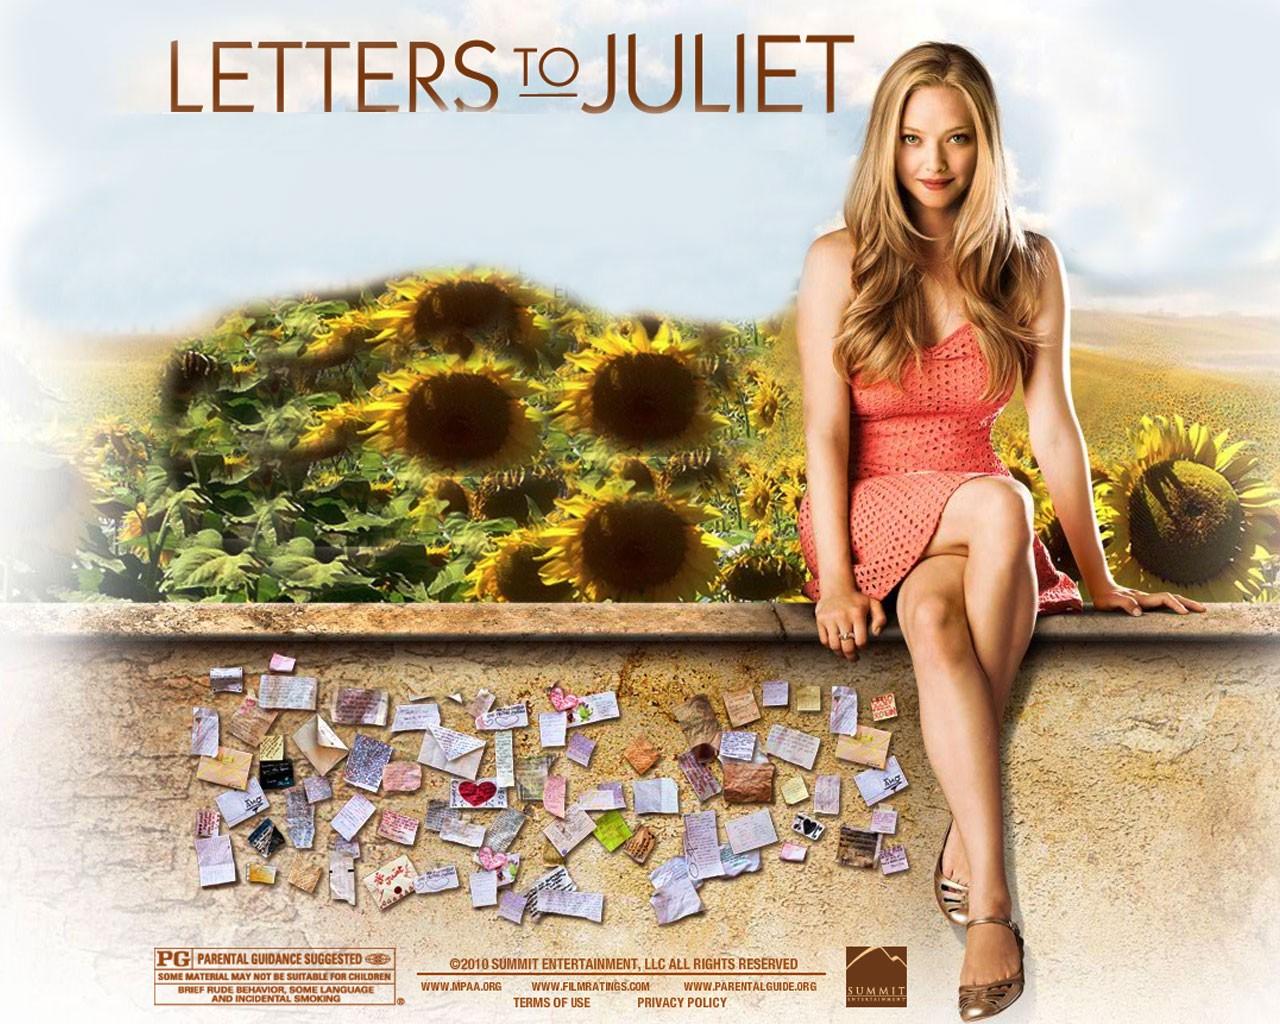 Programmi tv stasera, oggi 6 febbraio 2013: Olanda-Italia, Letters to Juliet, Mistero